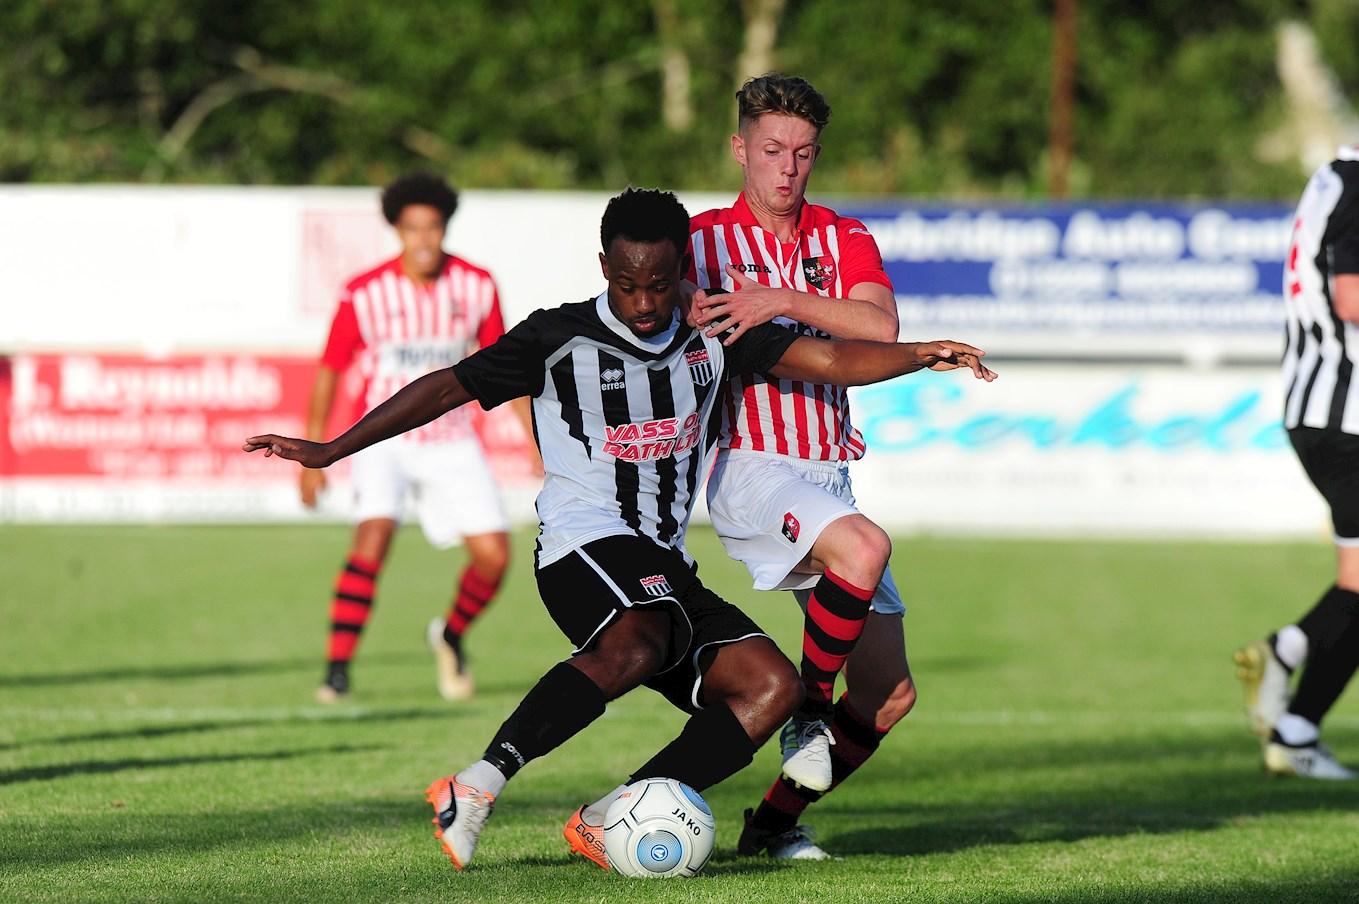 Season Ticket Loan >> Ben Seymour joins Weston-super-Mare on loan - News - Exeter City FC